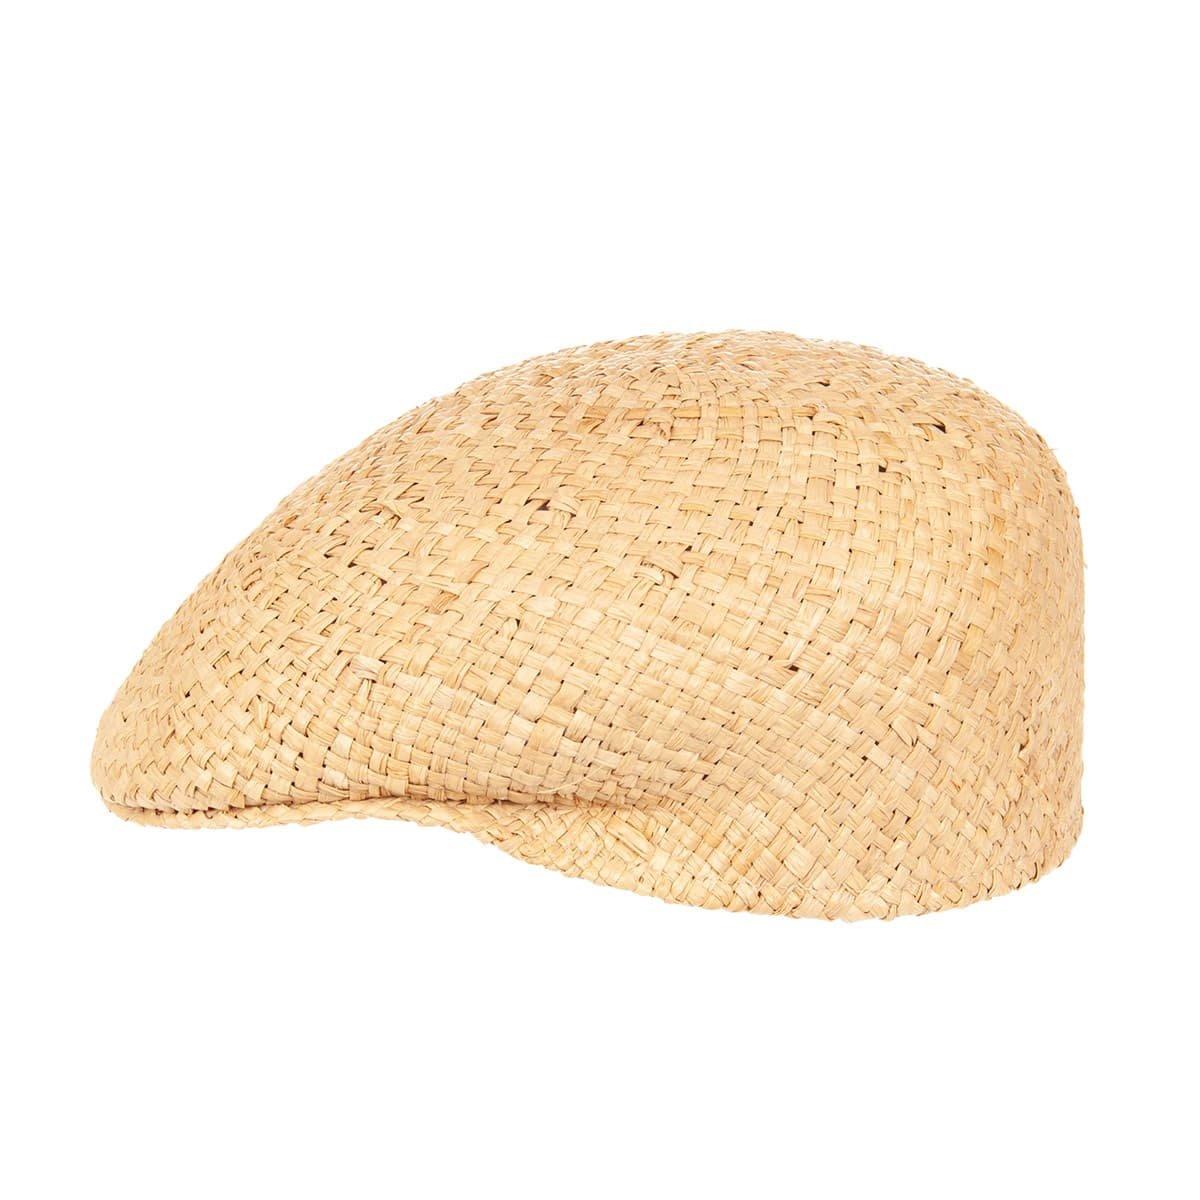 fbff233b60b Flat cap in straw by Hutter